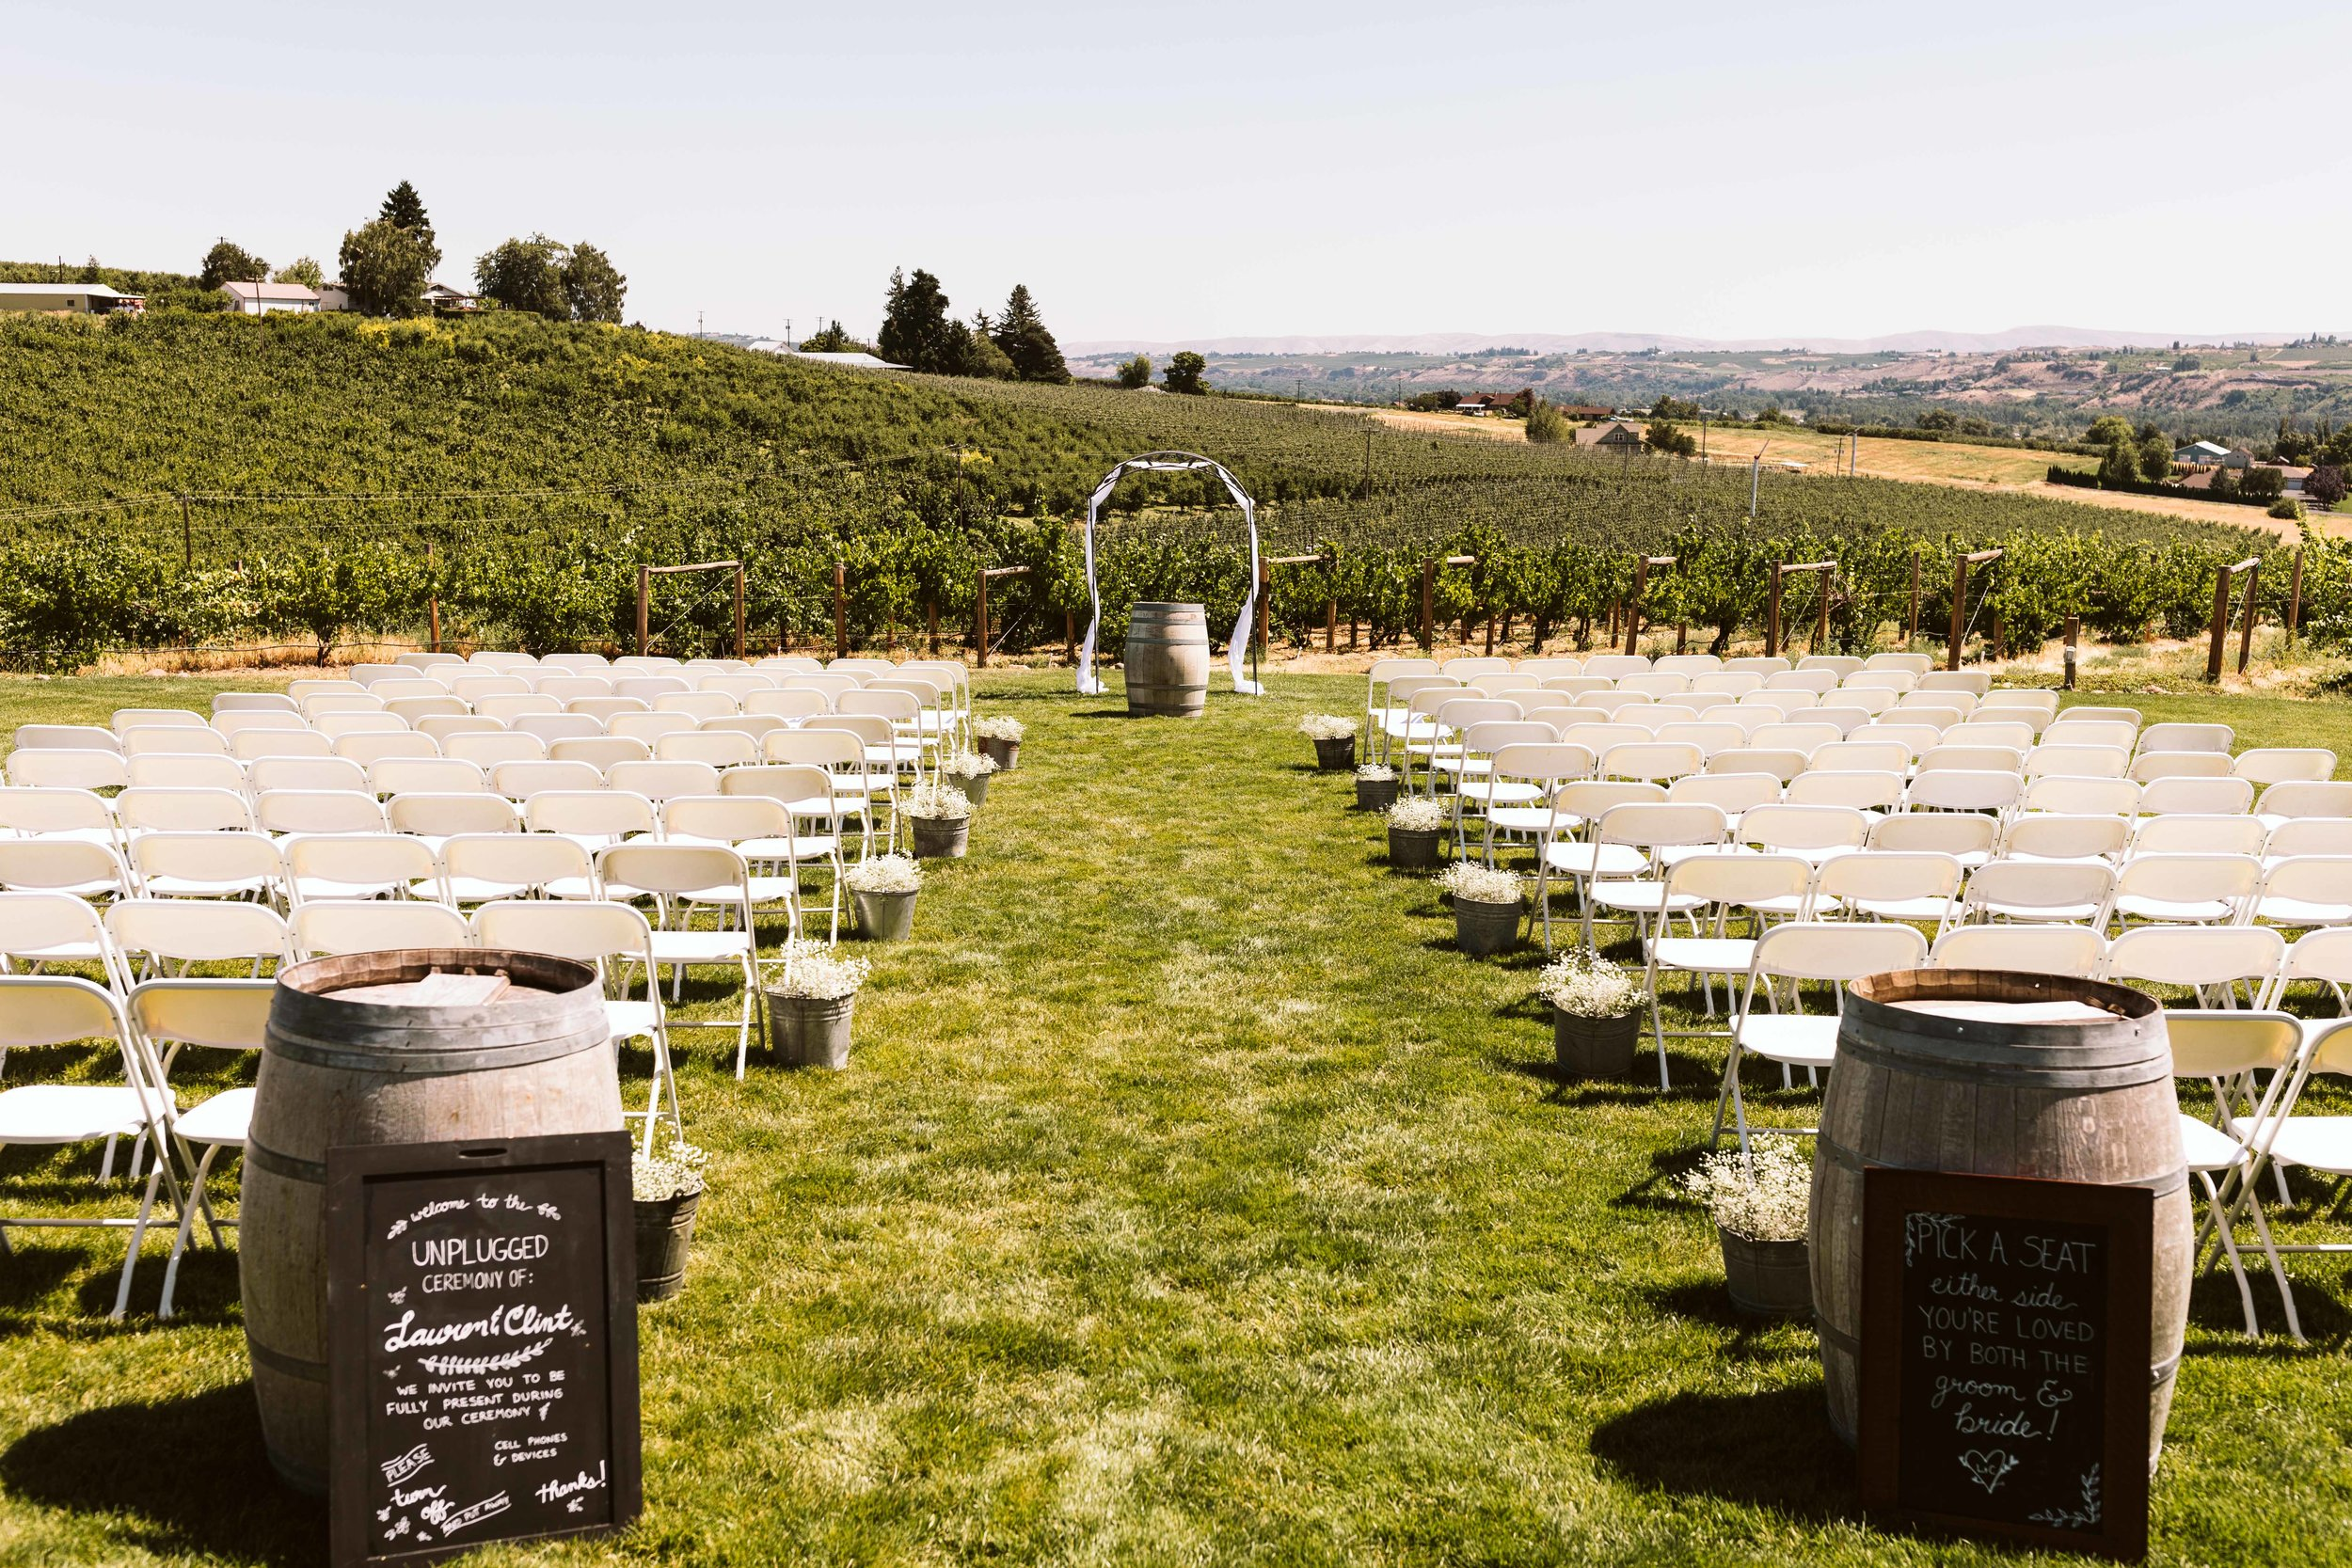 fontaine-estates-wedding-11.jpg